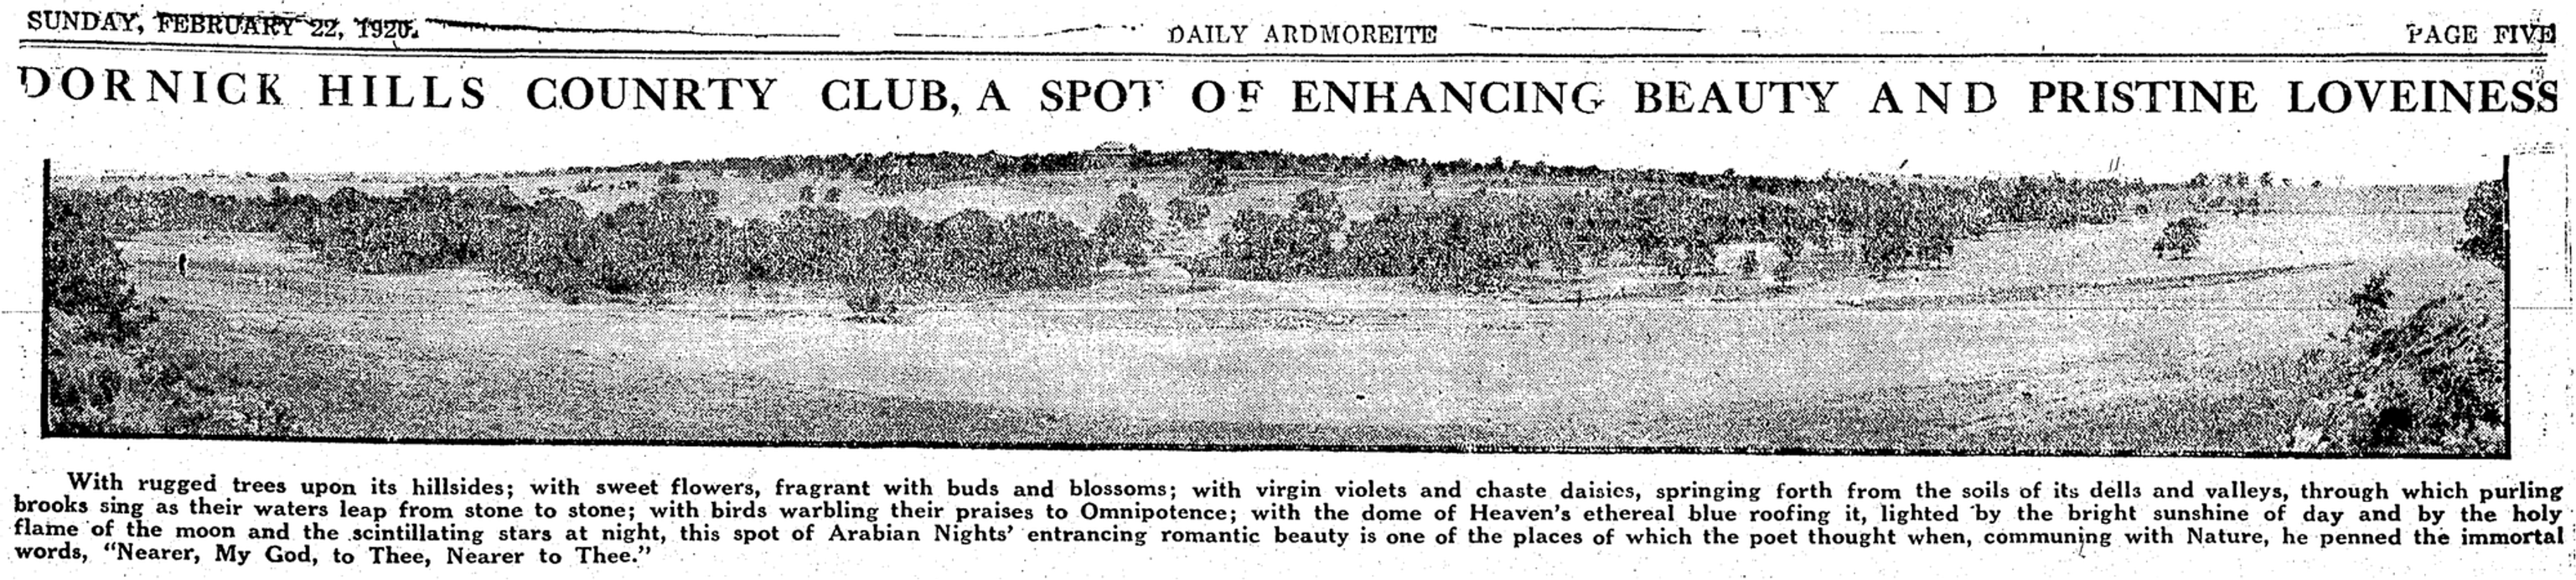 Photo 1920-2-22 Daily Ardmoreite Pg 5 -